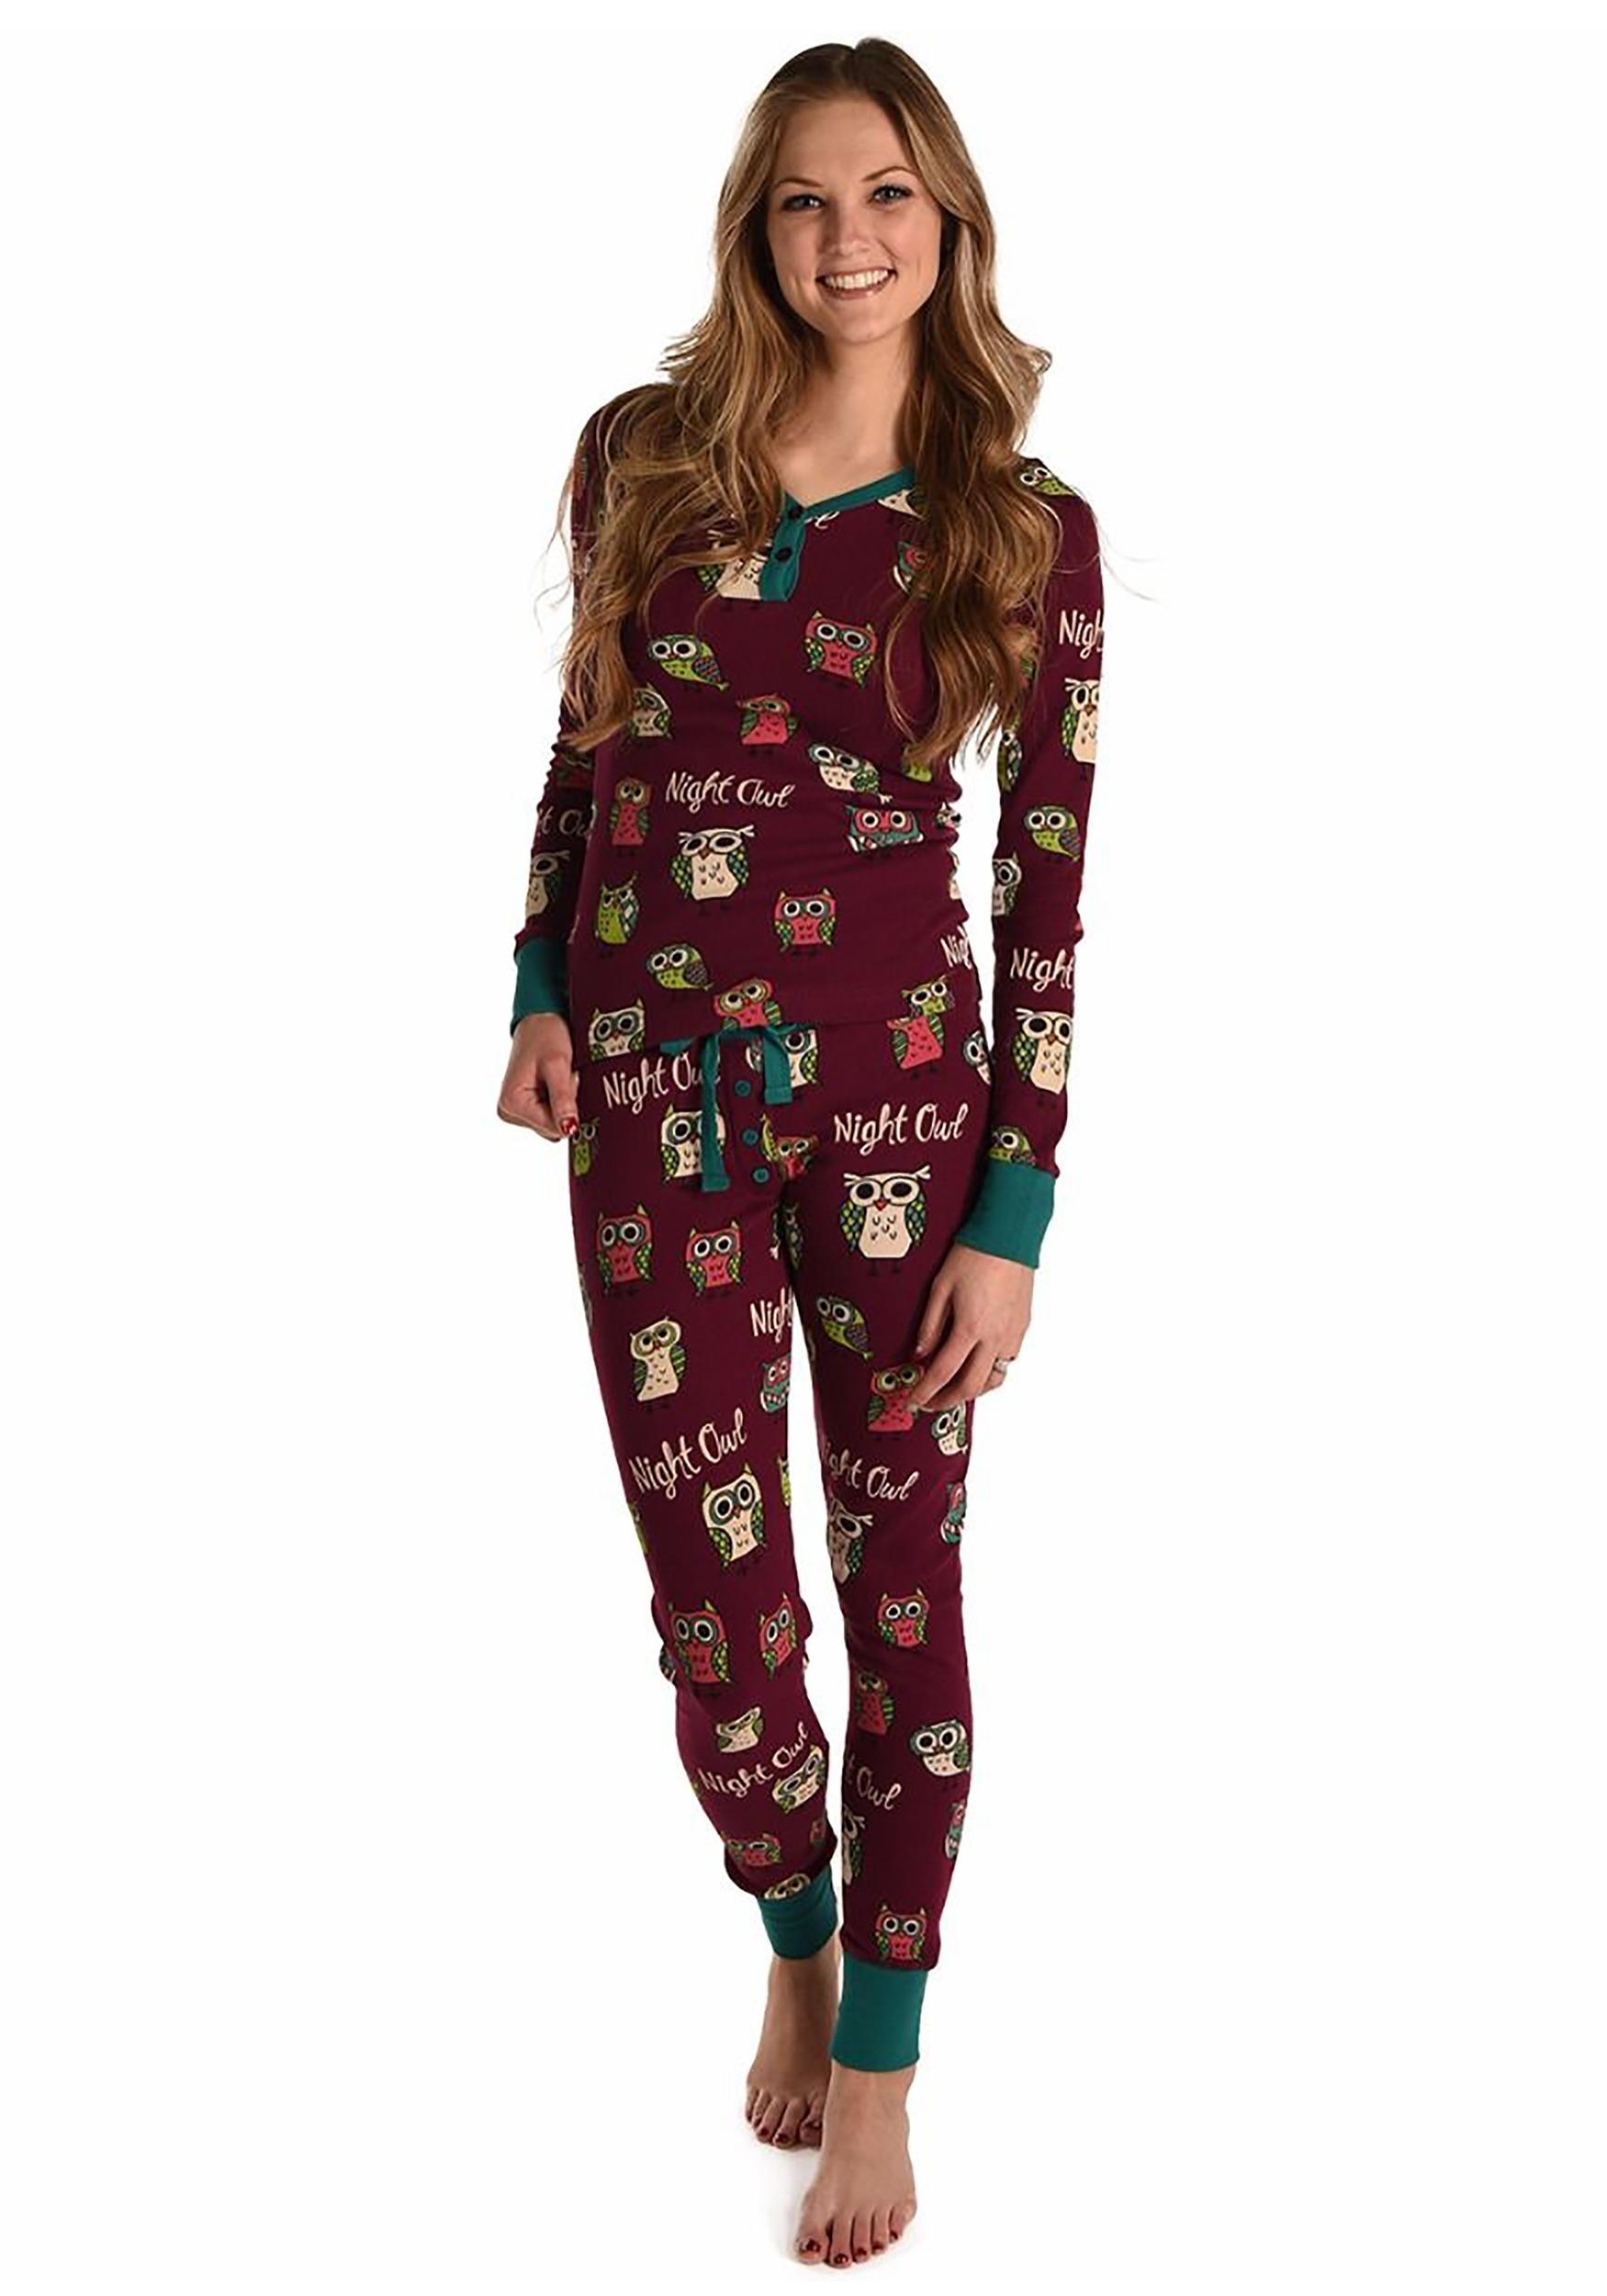 51f72665d1 Night Owl Thermeez Purple Women s Pajama Set